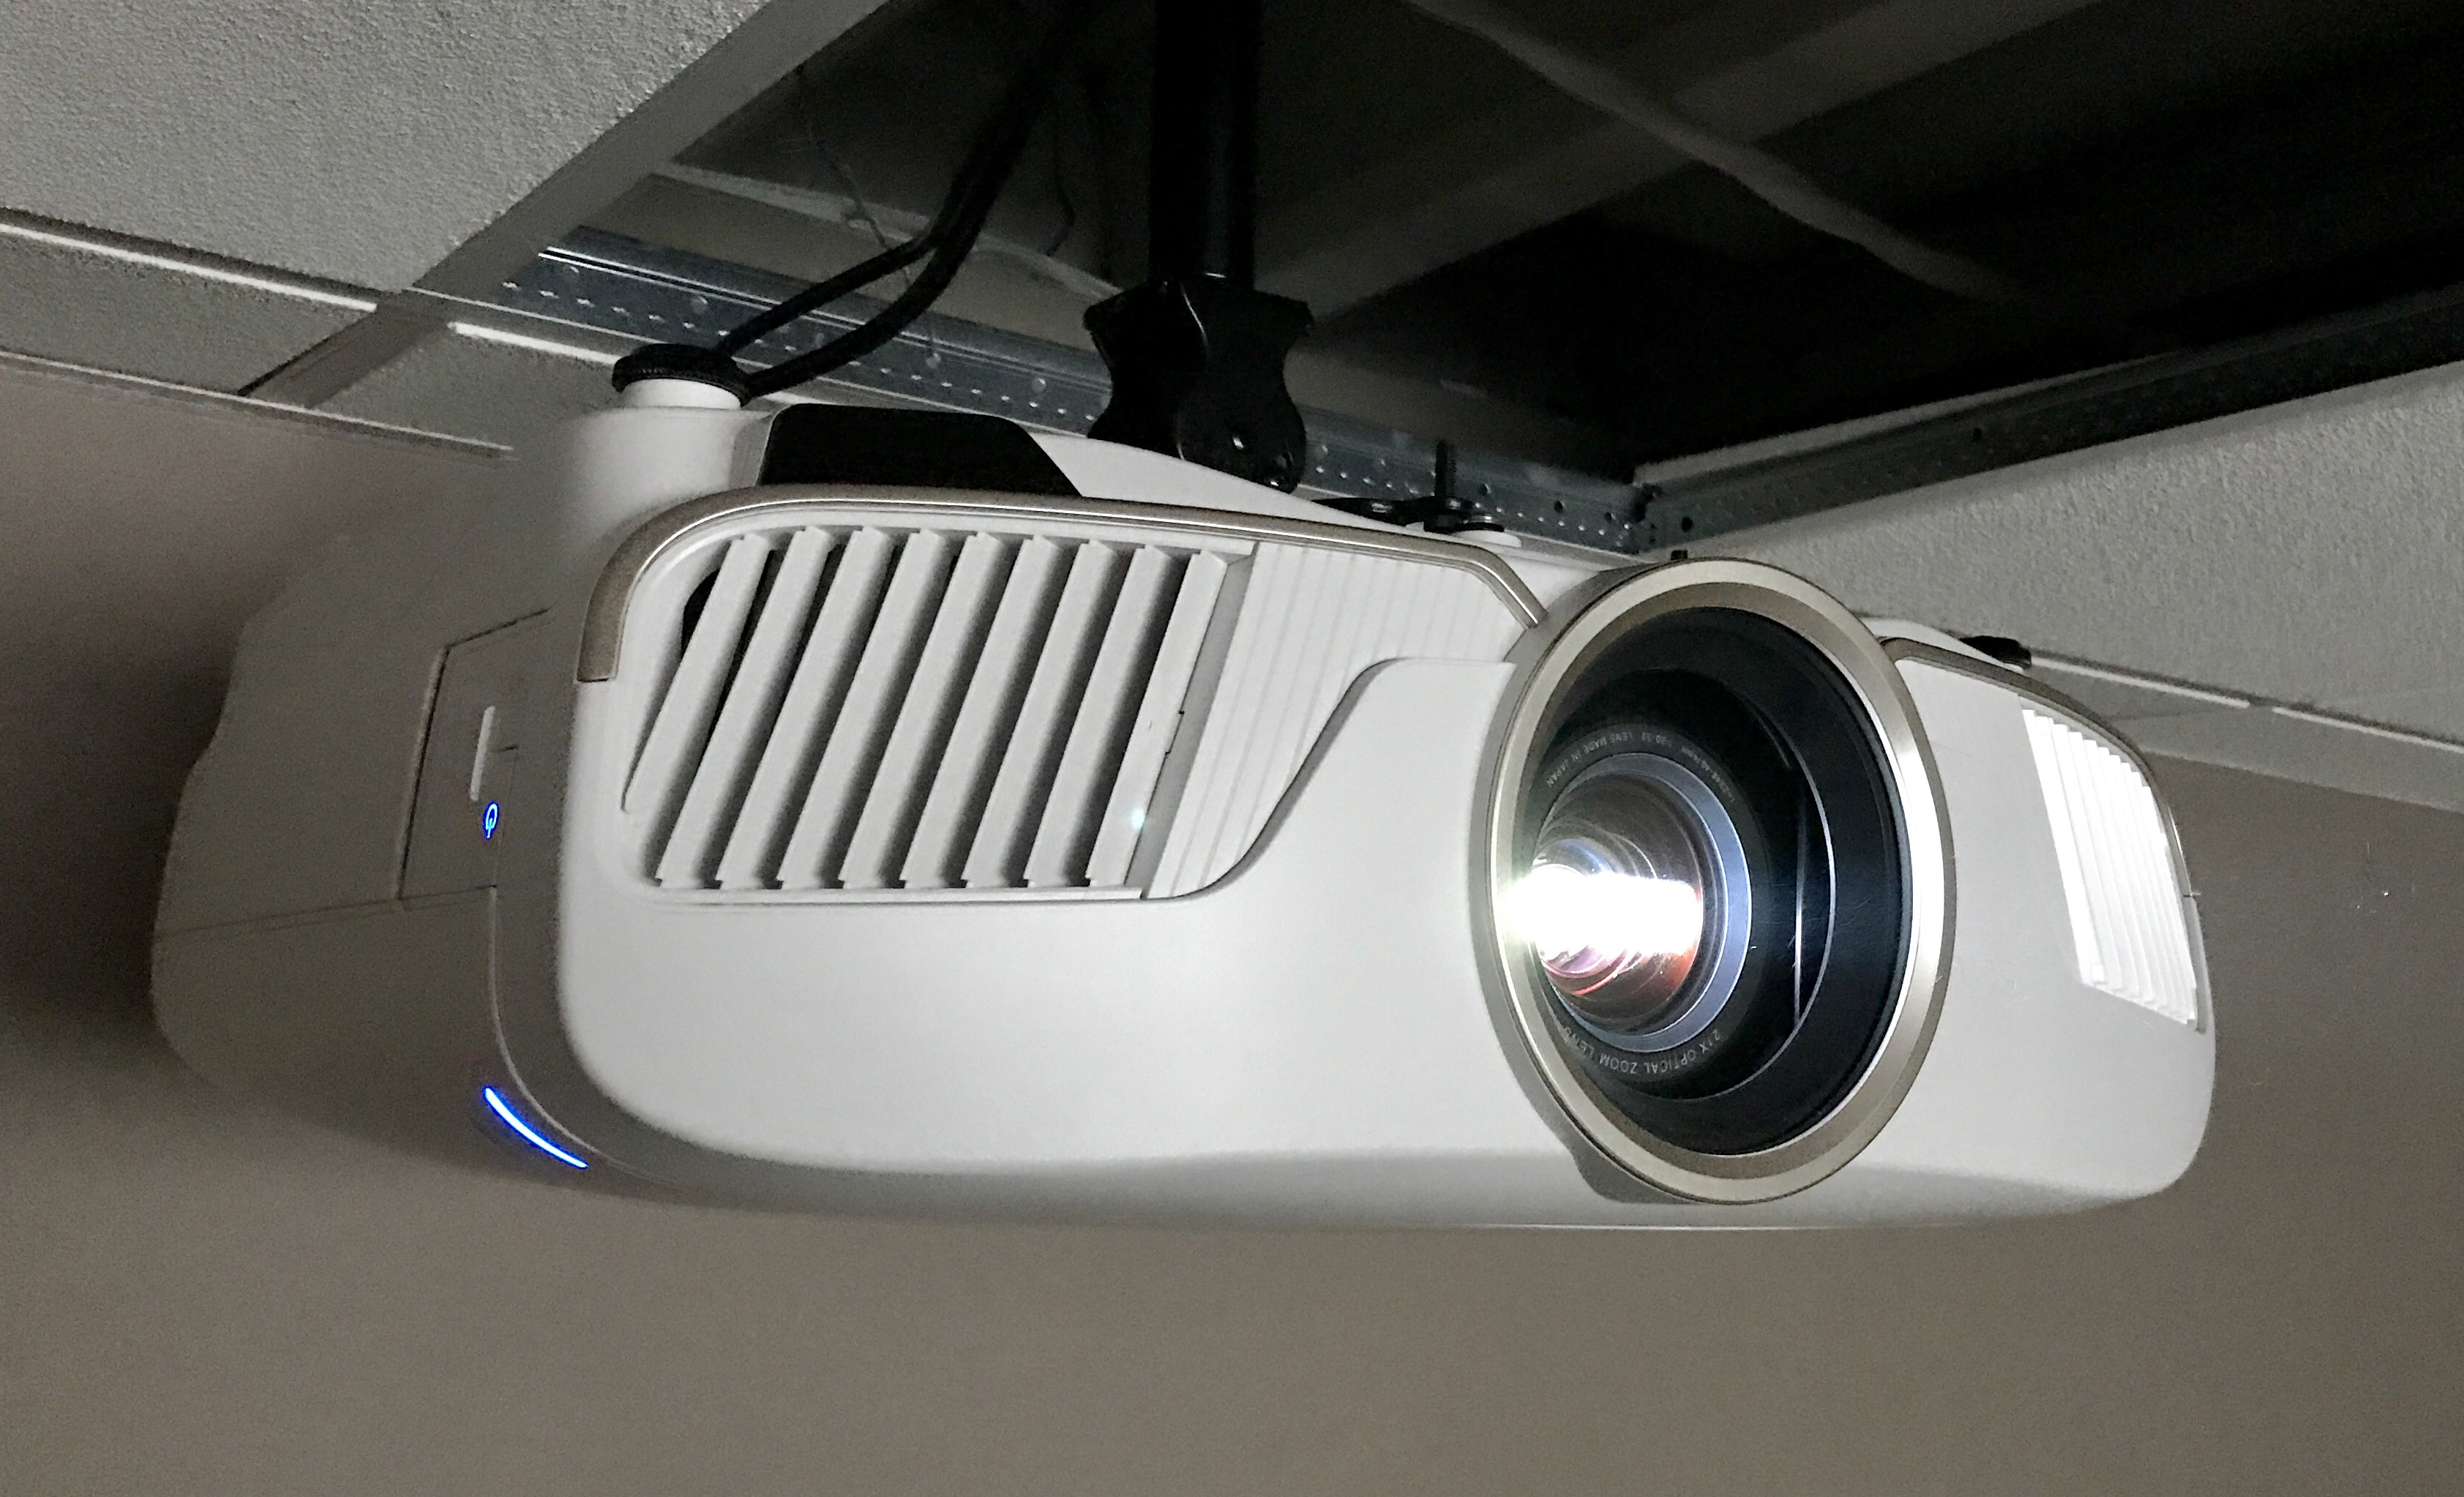 Connecti Epson Home Cinema 5040Ub – Meta Morphoz